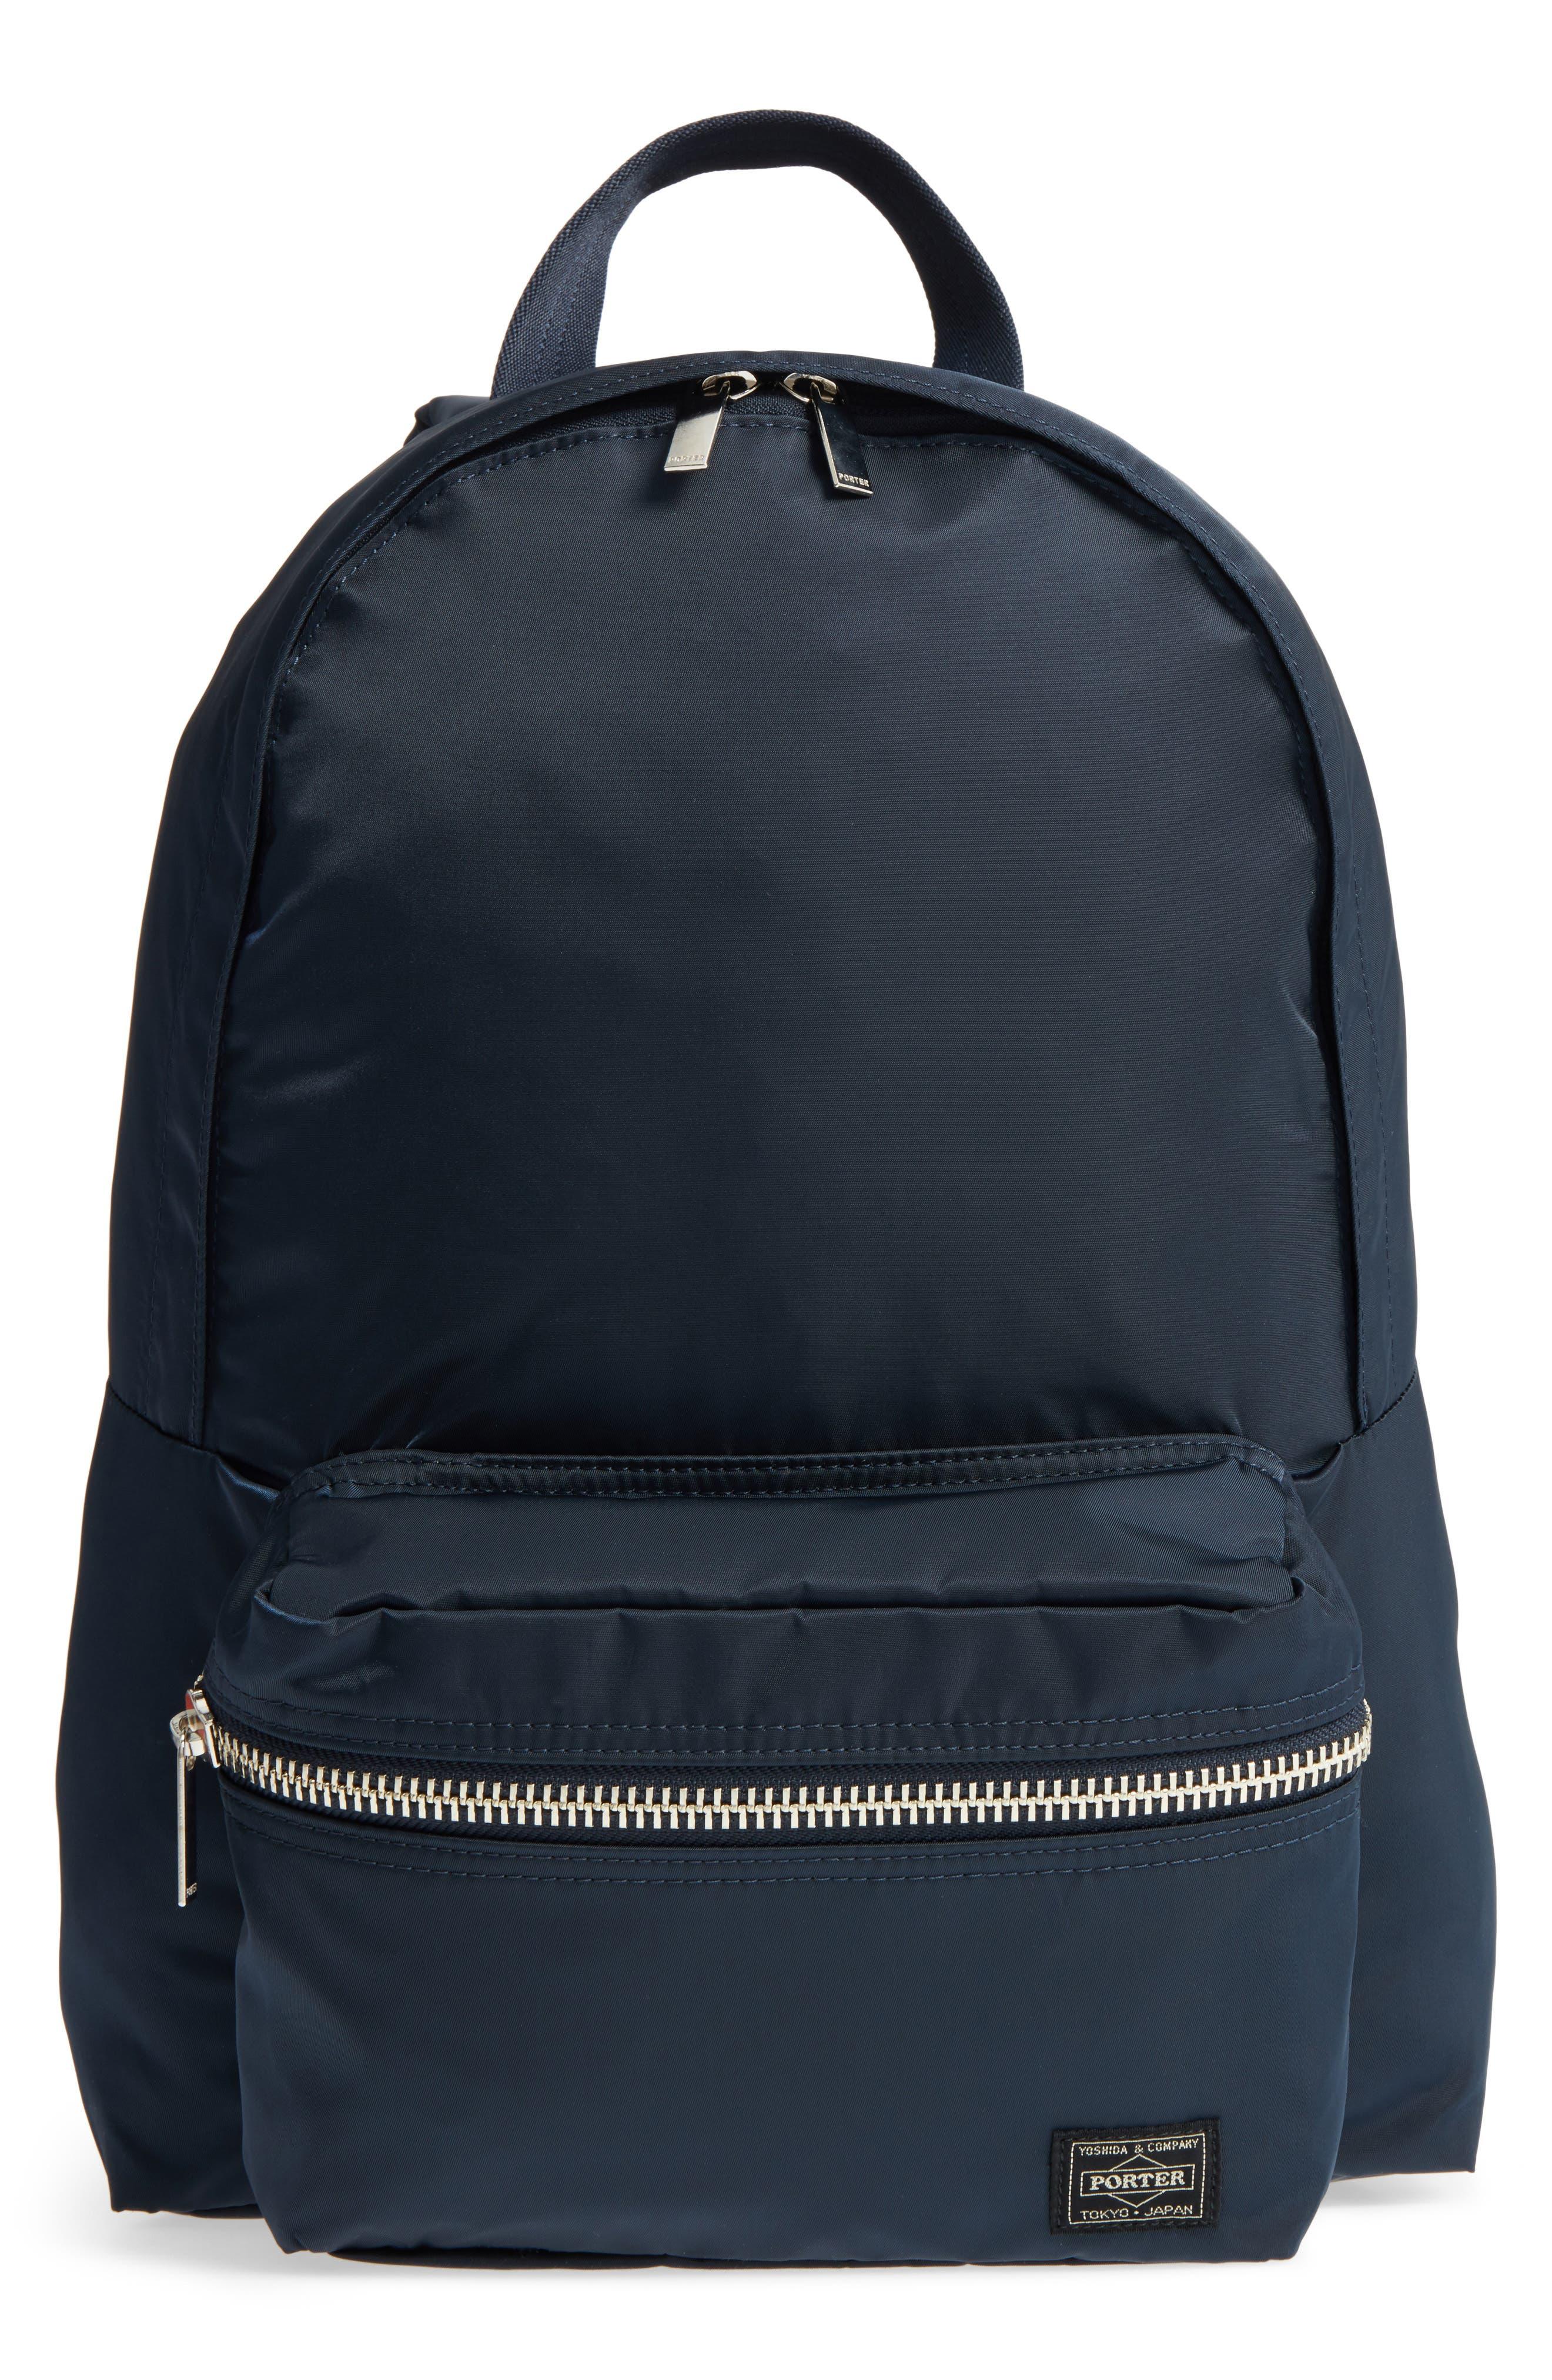 Porter-Yoshida & Co. Daily Backpack,                         Main,                         color, Navy